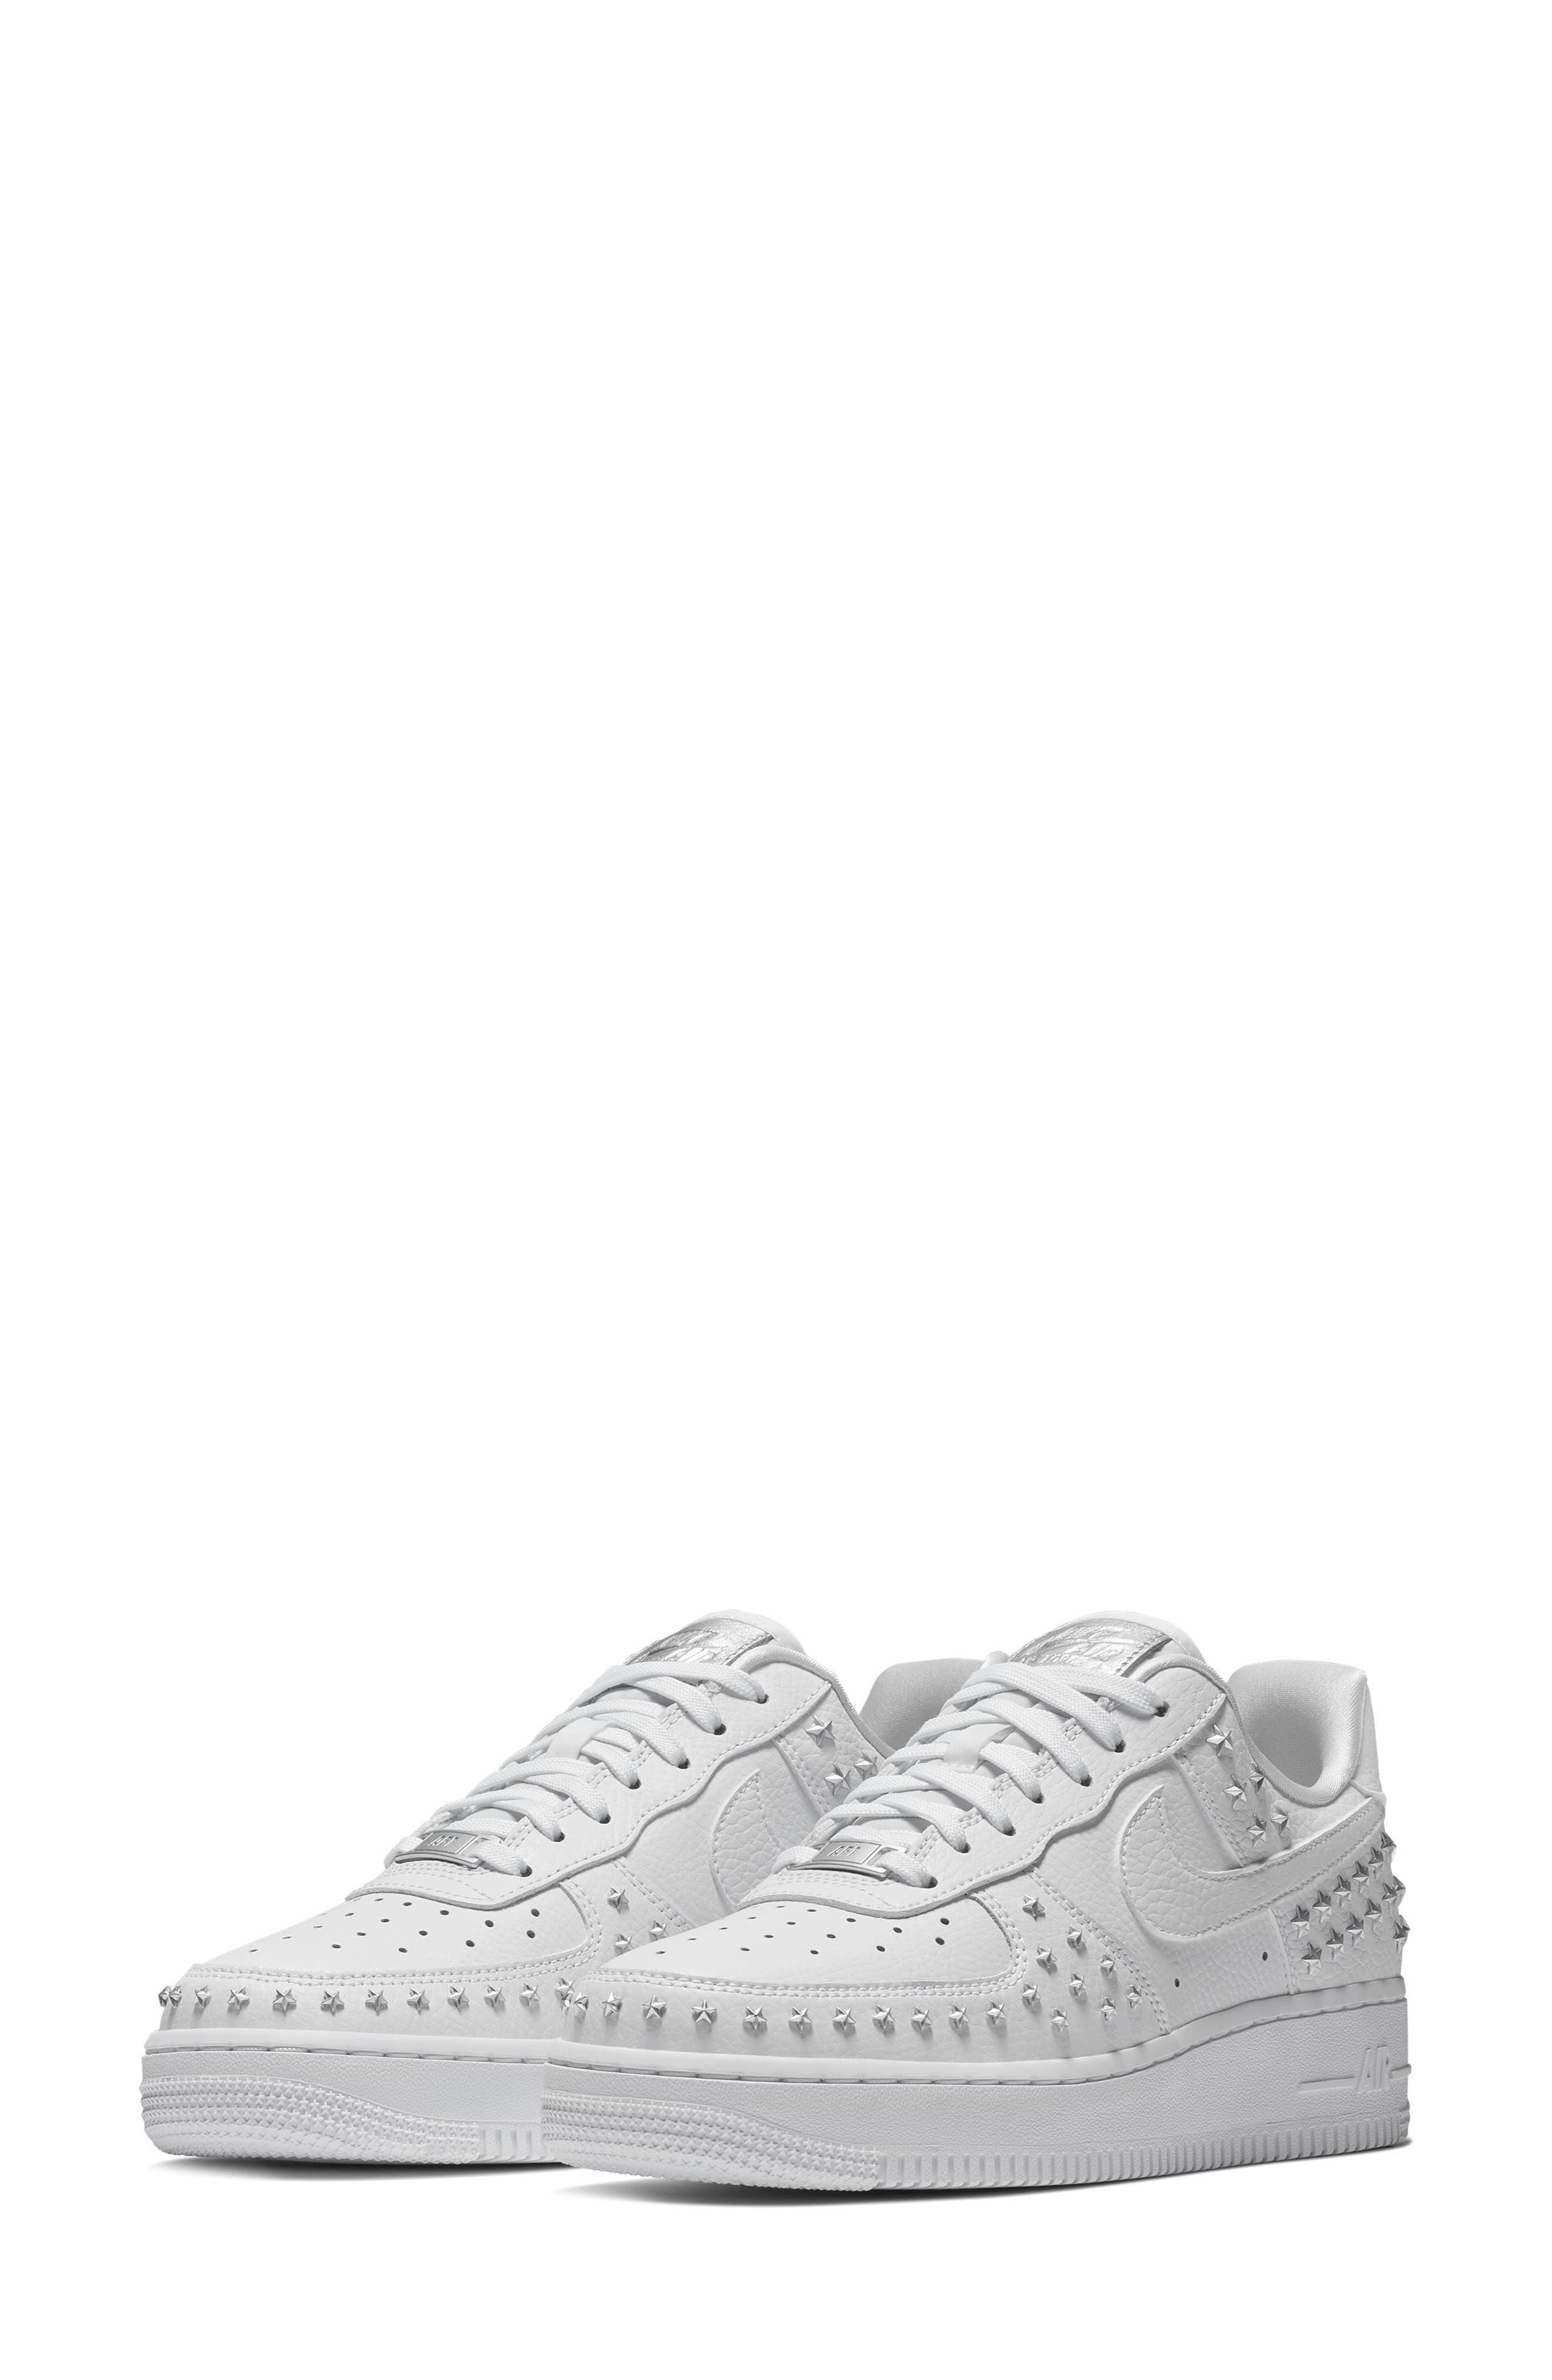 Air Force 1 '07 XX Sneaker,                             Main thumbnail 1, color,                             WHITE/ WHITE/ WHITE